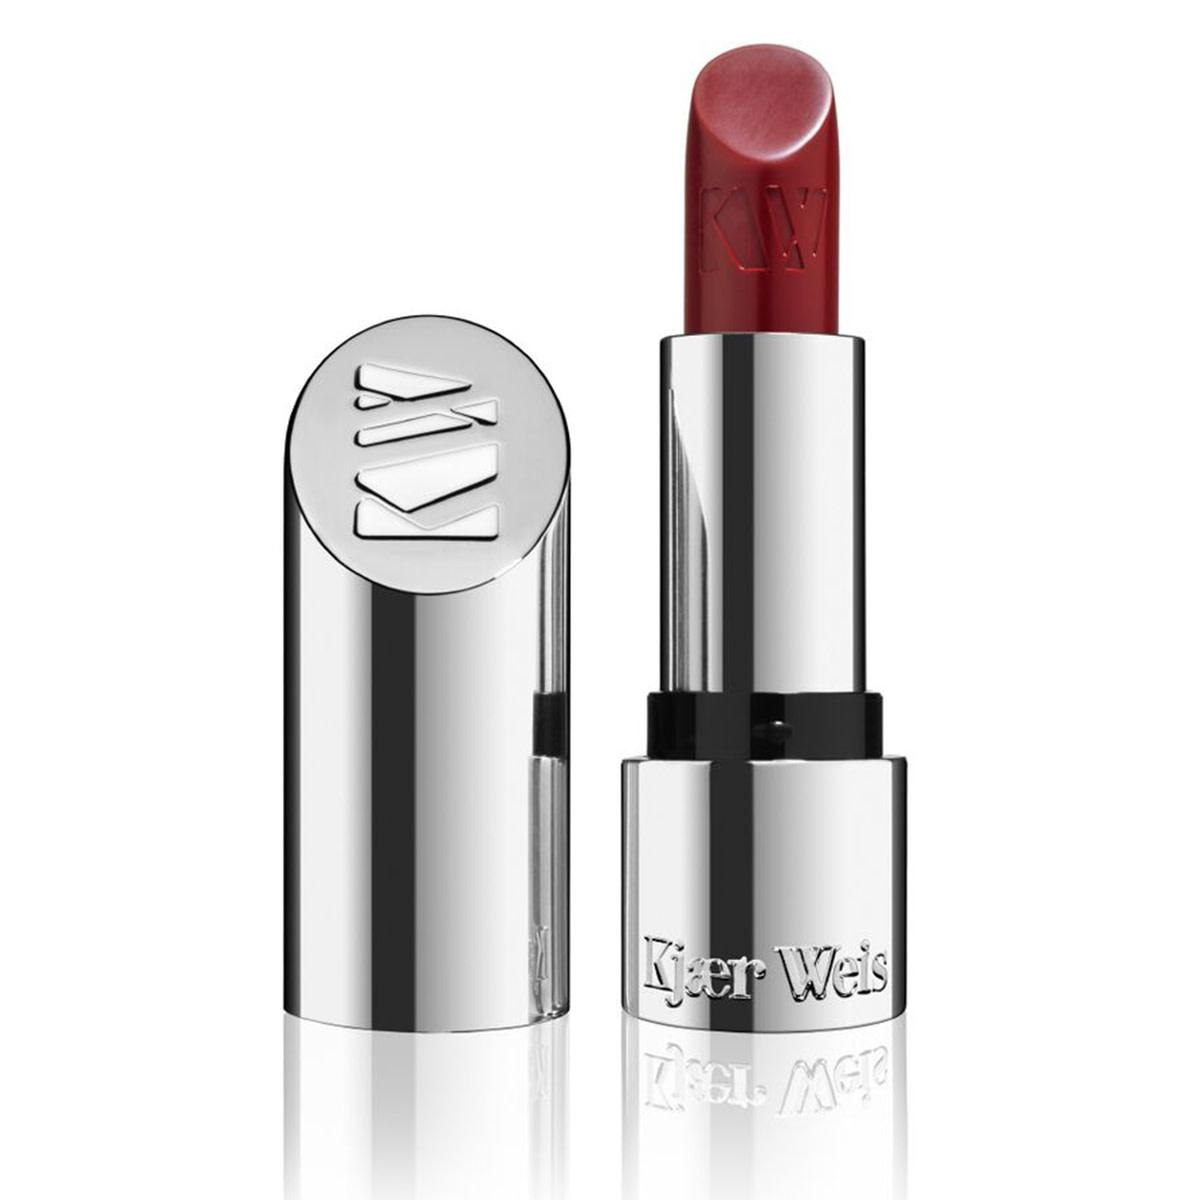 Kjaer Weis Lipstick in Adore